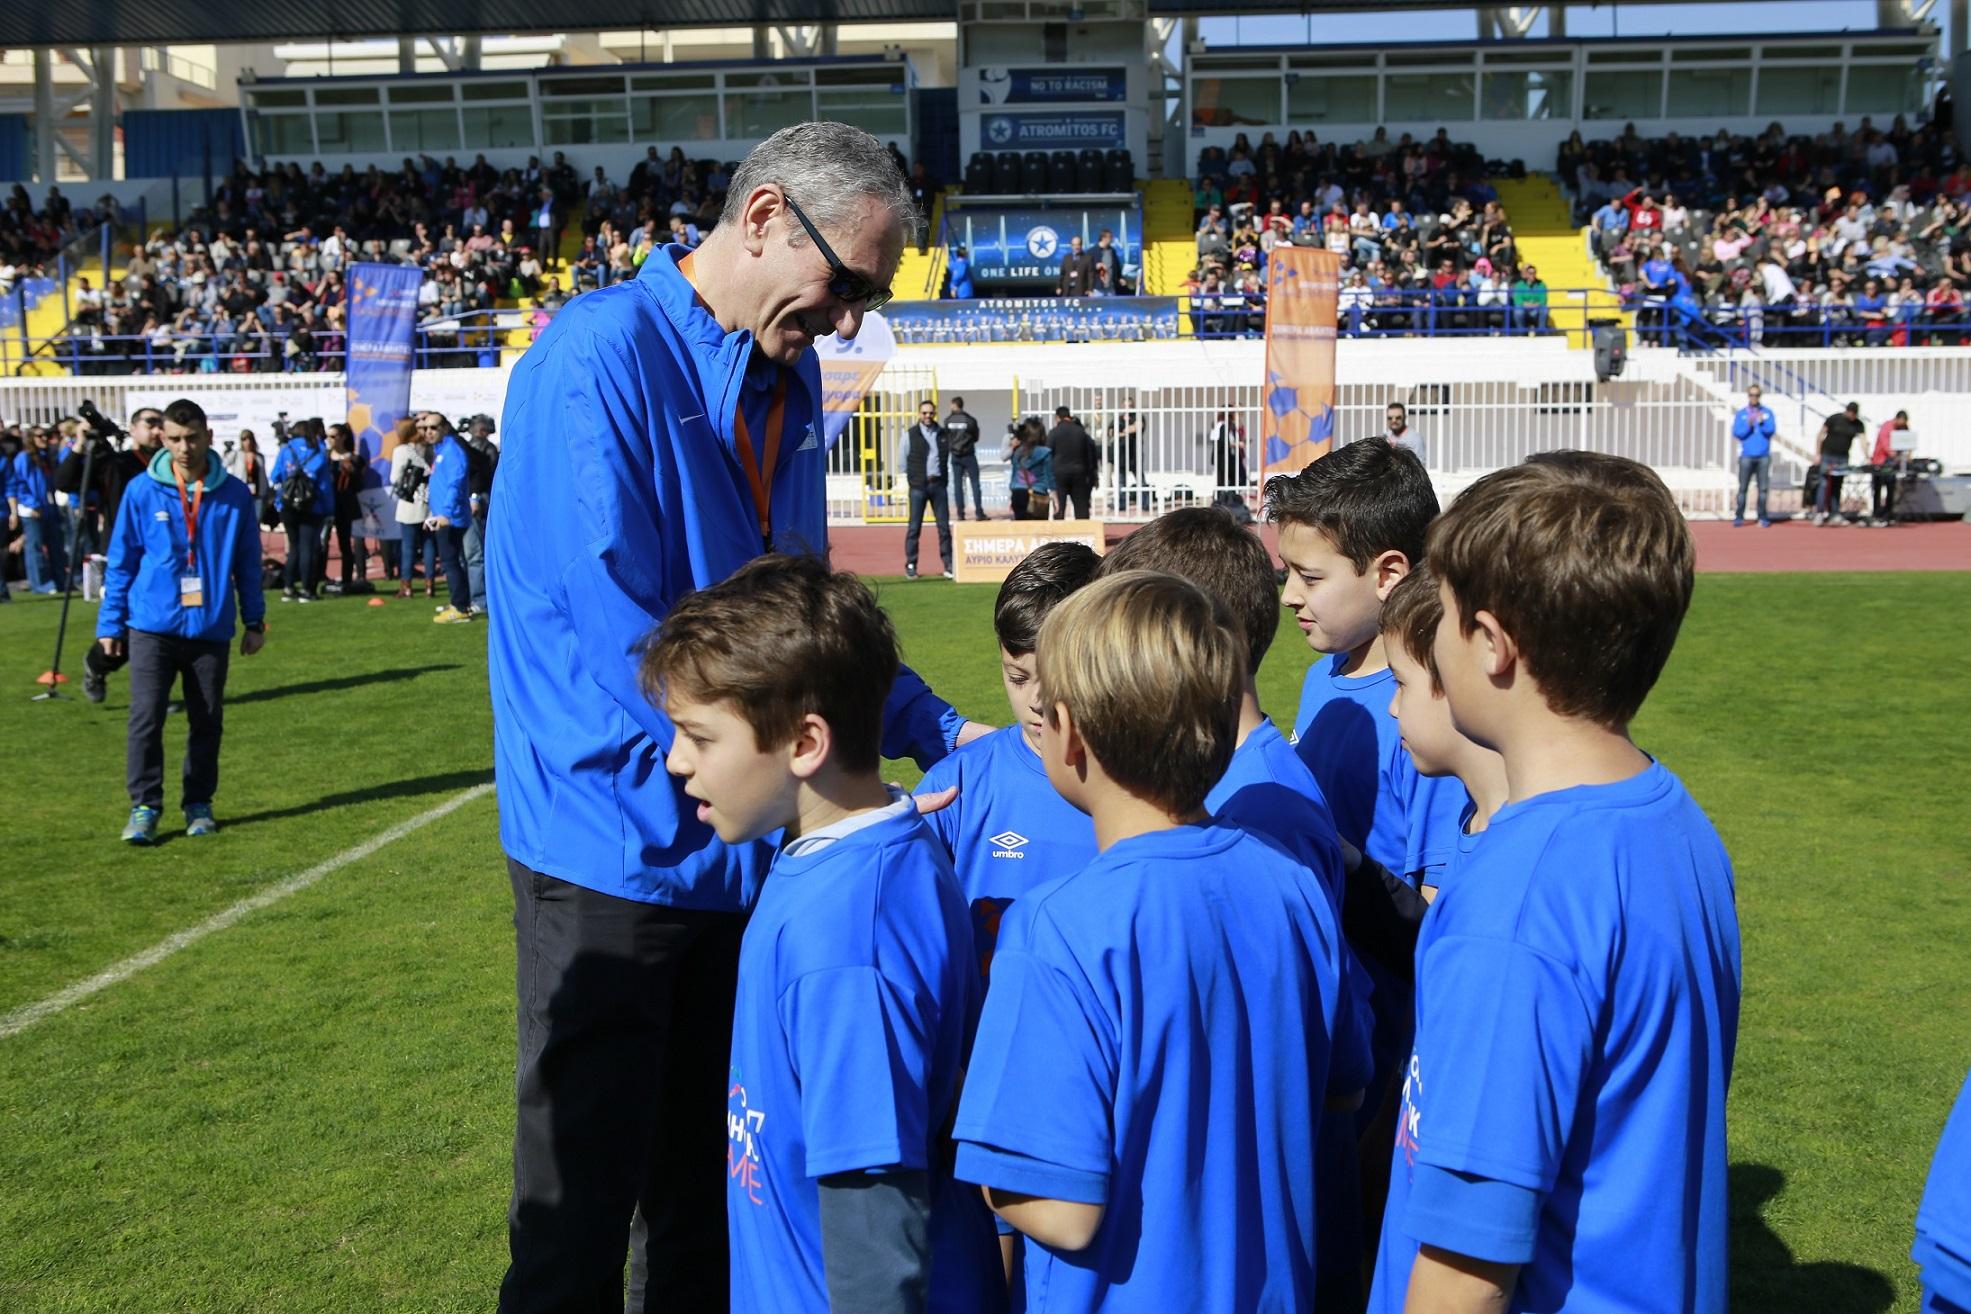 O κ. Κ. Ζίγκλερ Πρόεδρος και Διευθύνων Σύμβουλος της ΟΠΑΠ μαζί με μικρούς αθλητές των ακαδημιών 3